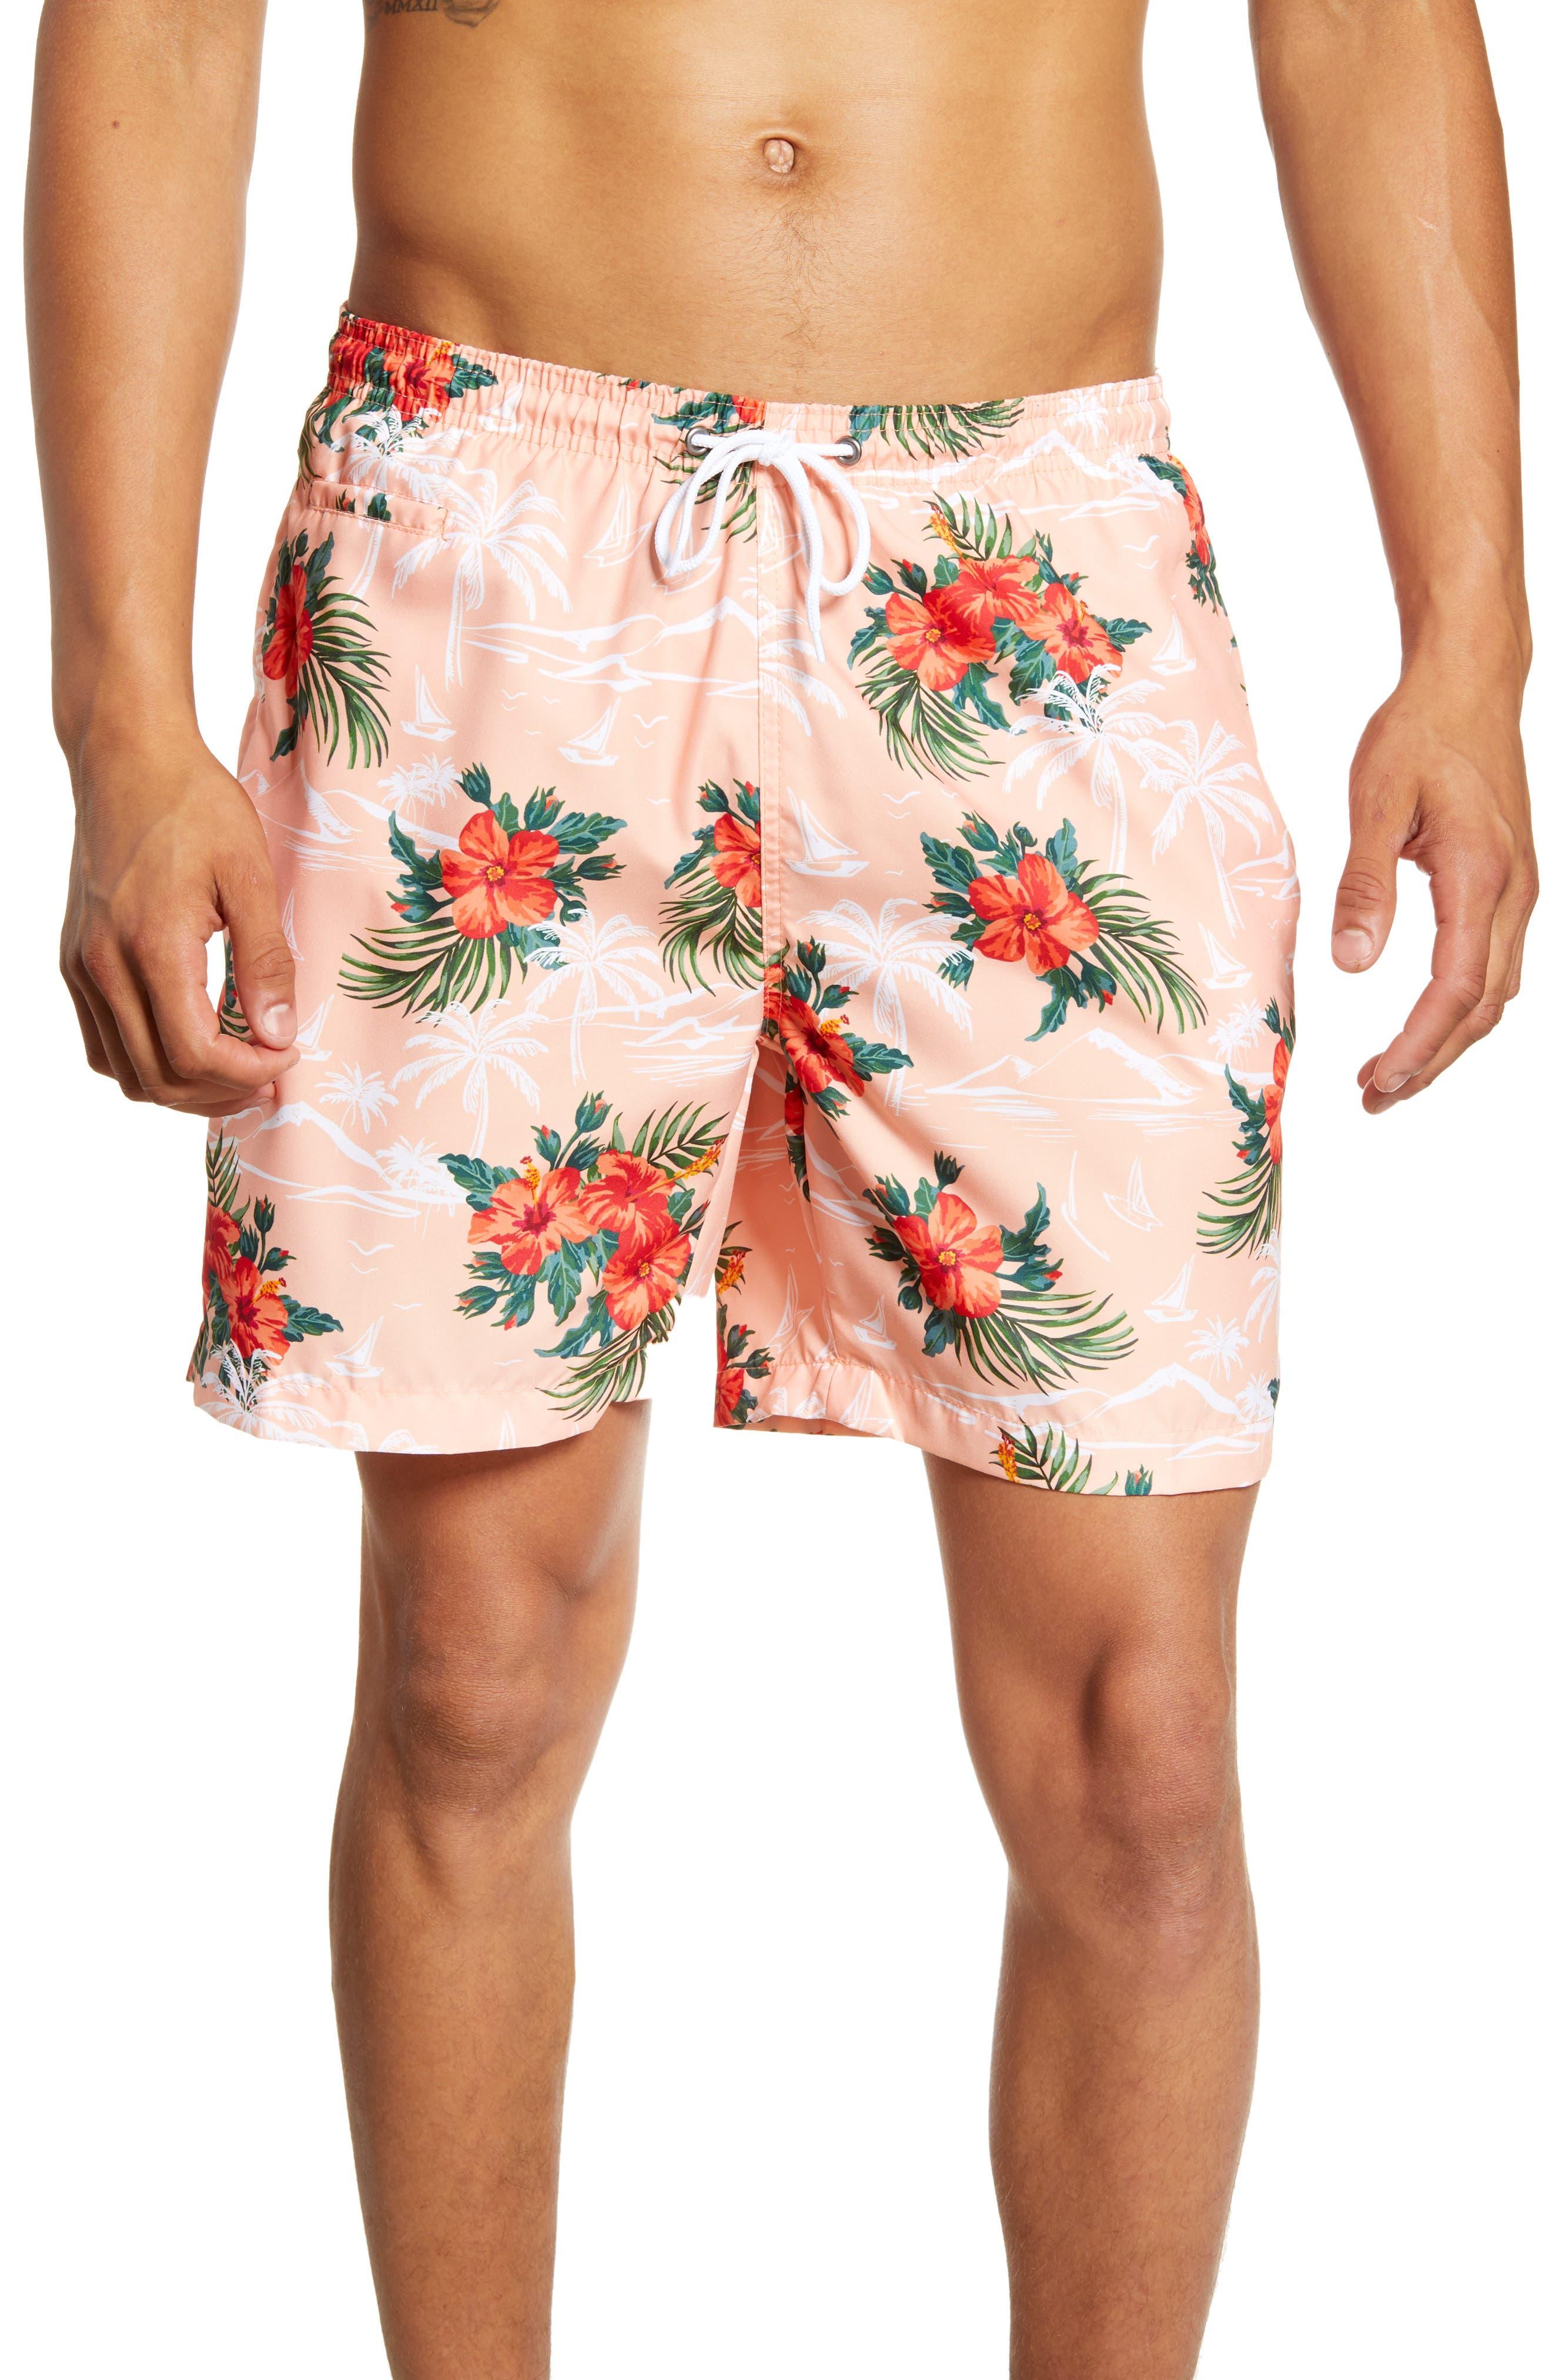 Trunks Surf & Swim Co. Sano Tropical Print Swim Trunks, Coral